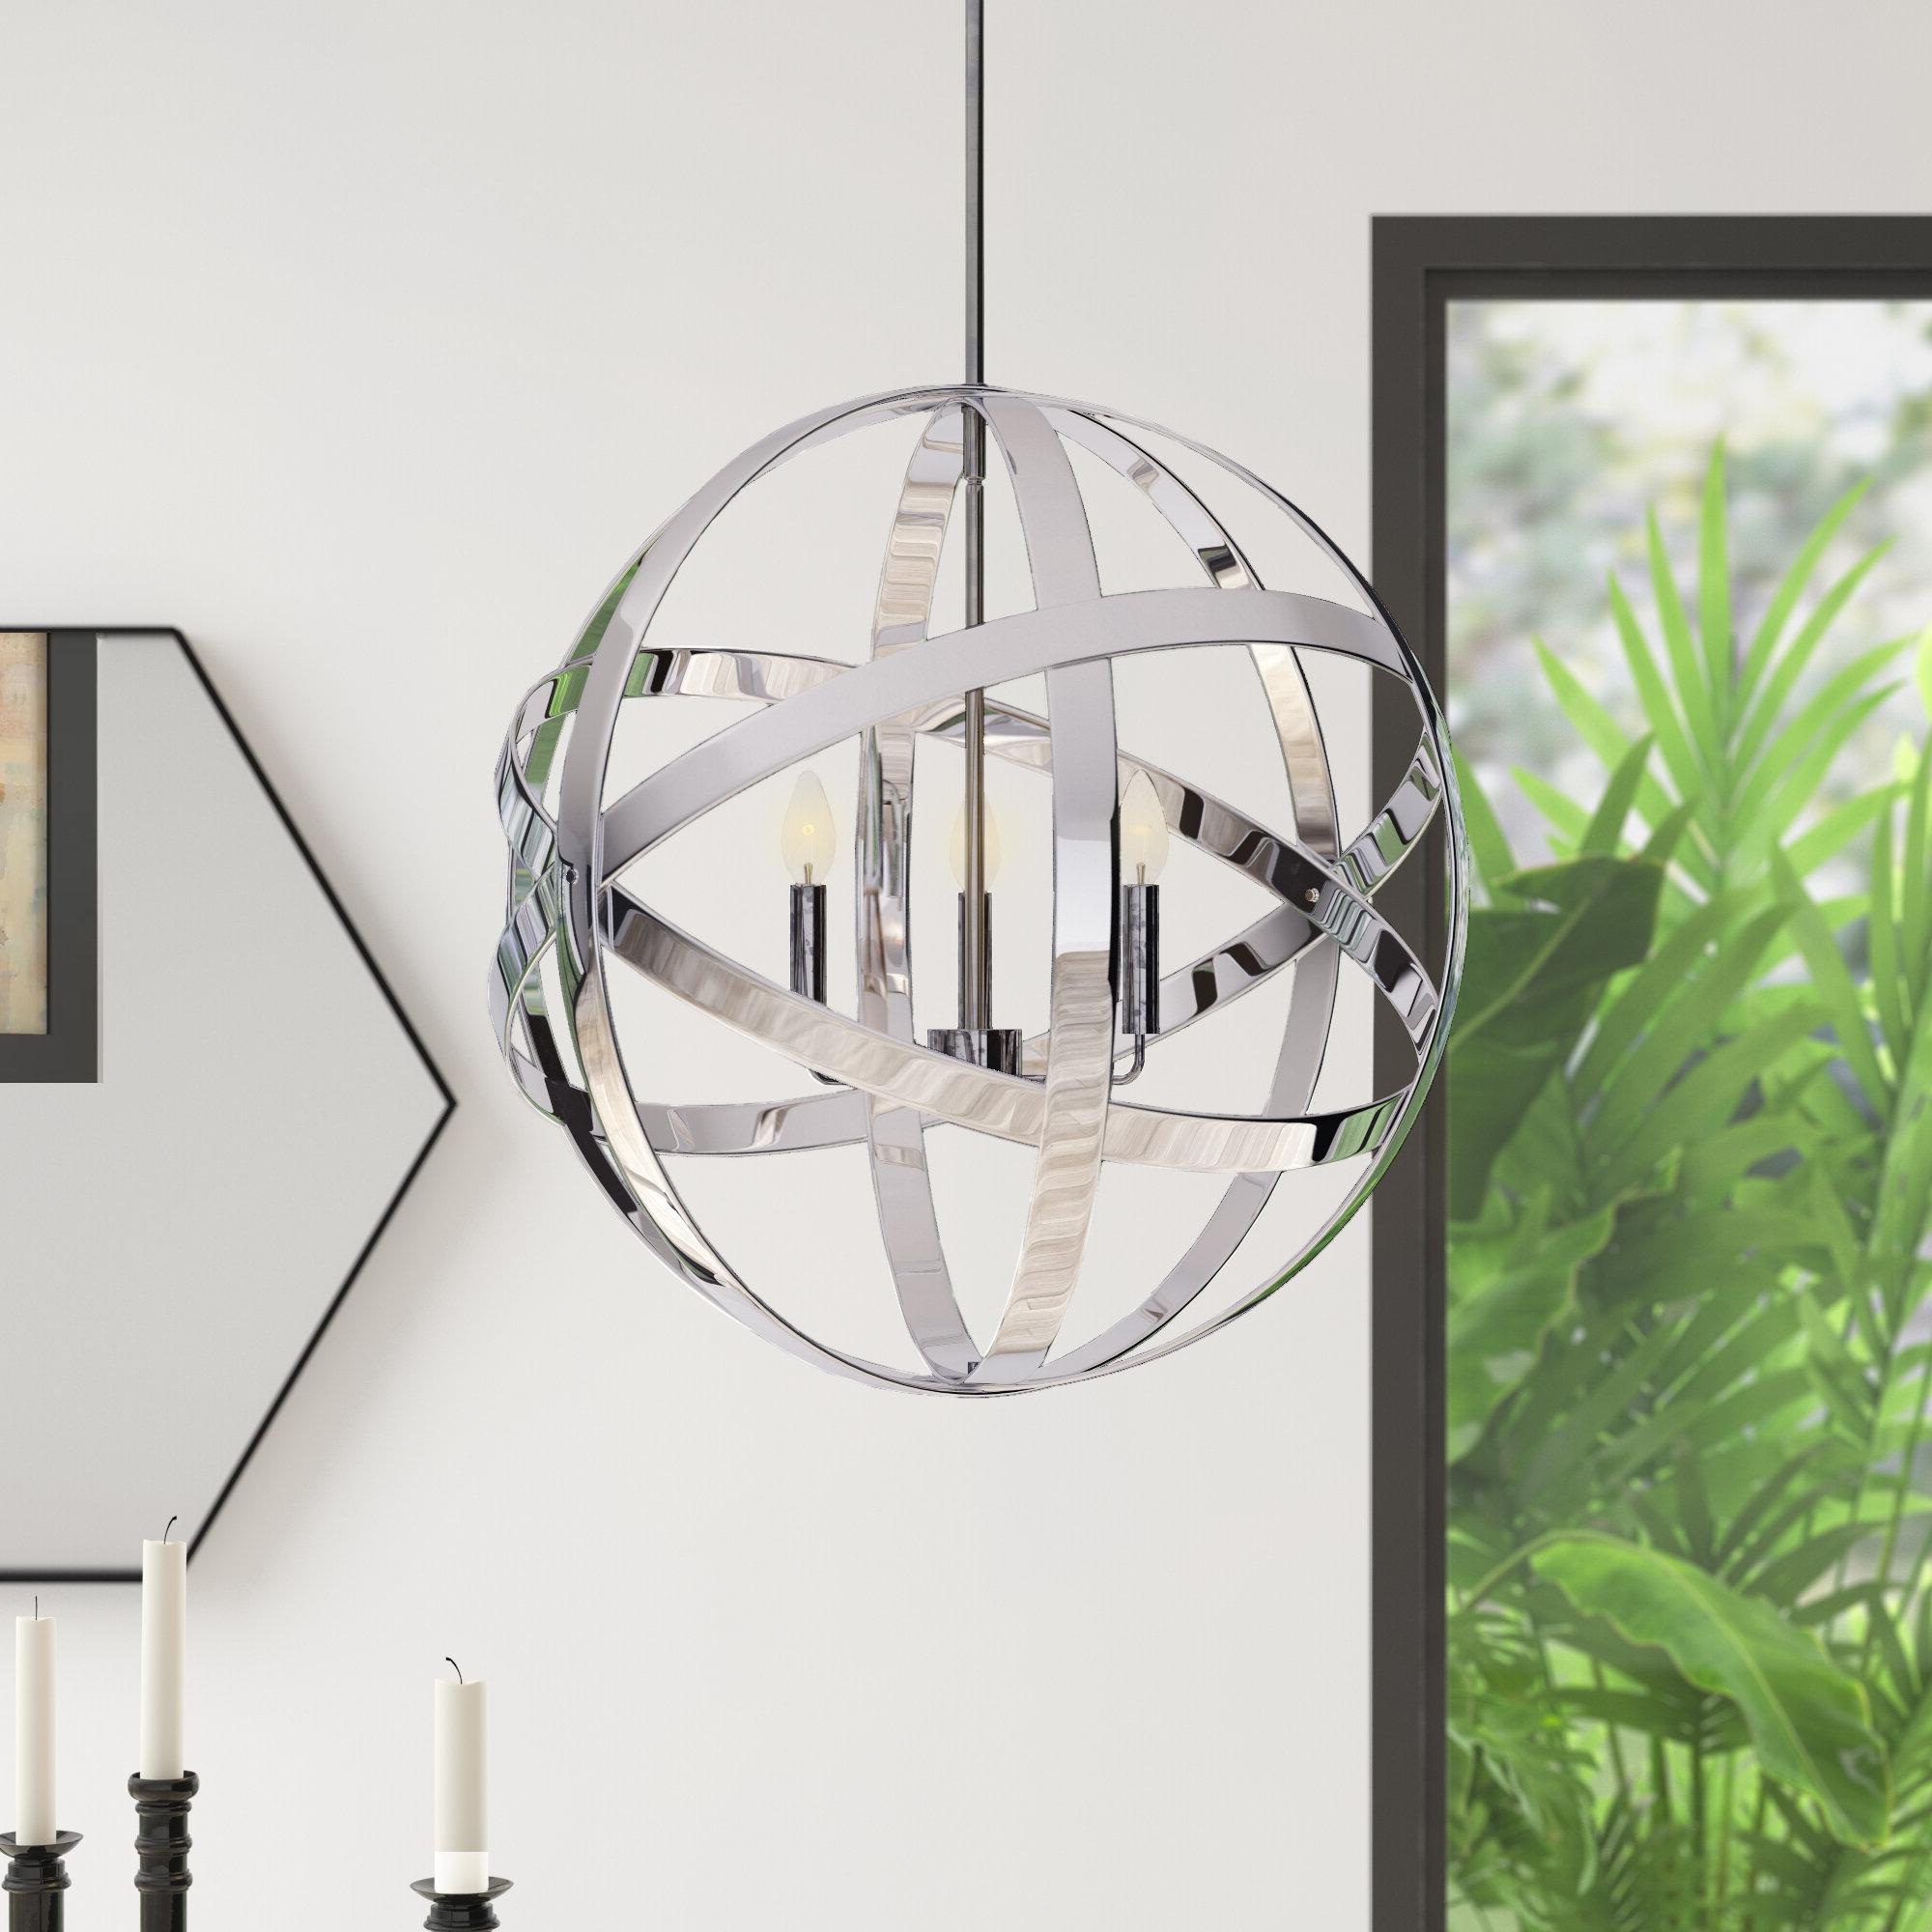 Curcio 3 Light Globe Chandelier For 2020 Adcock 3 Light Single Globe Pendants (View 9 of 25)